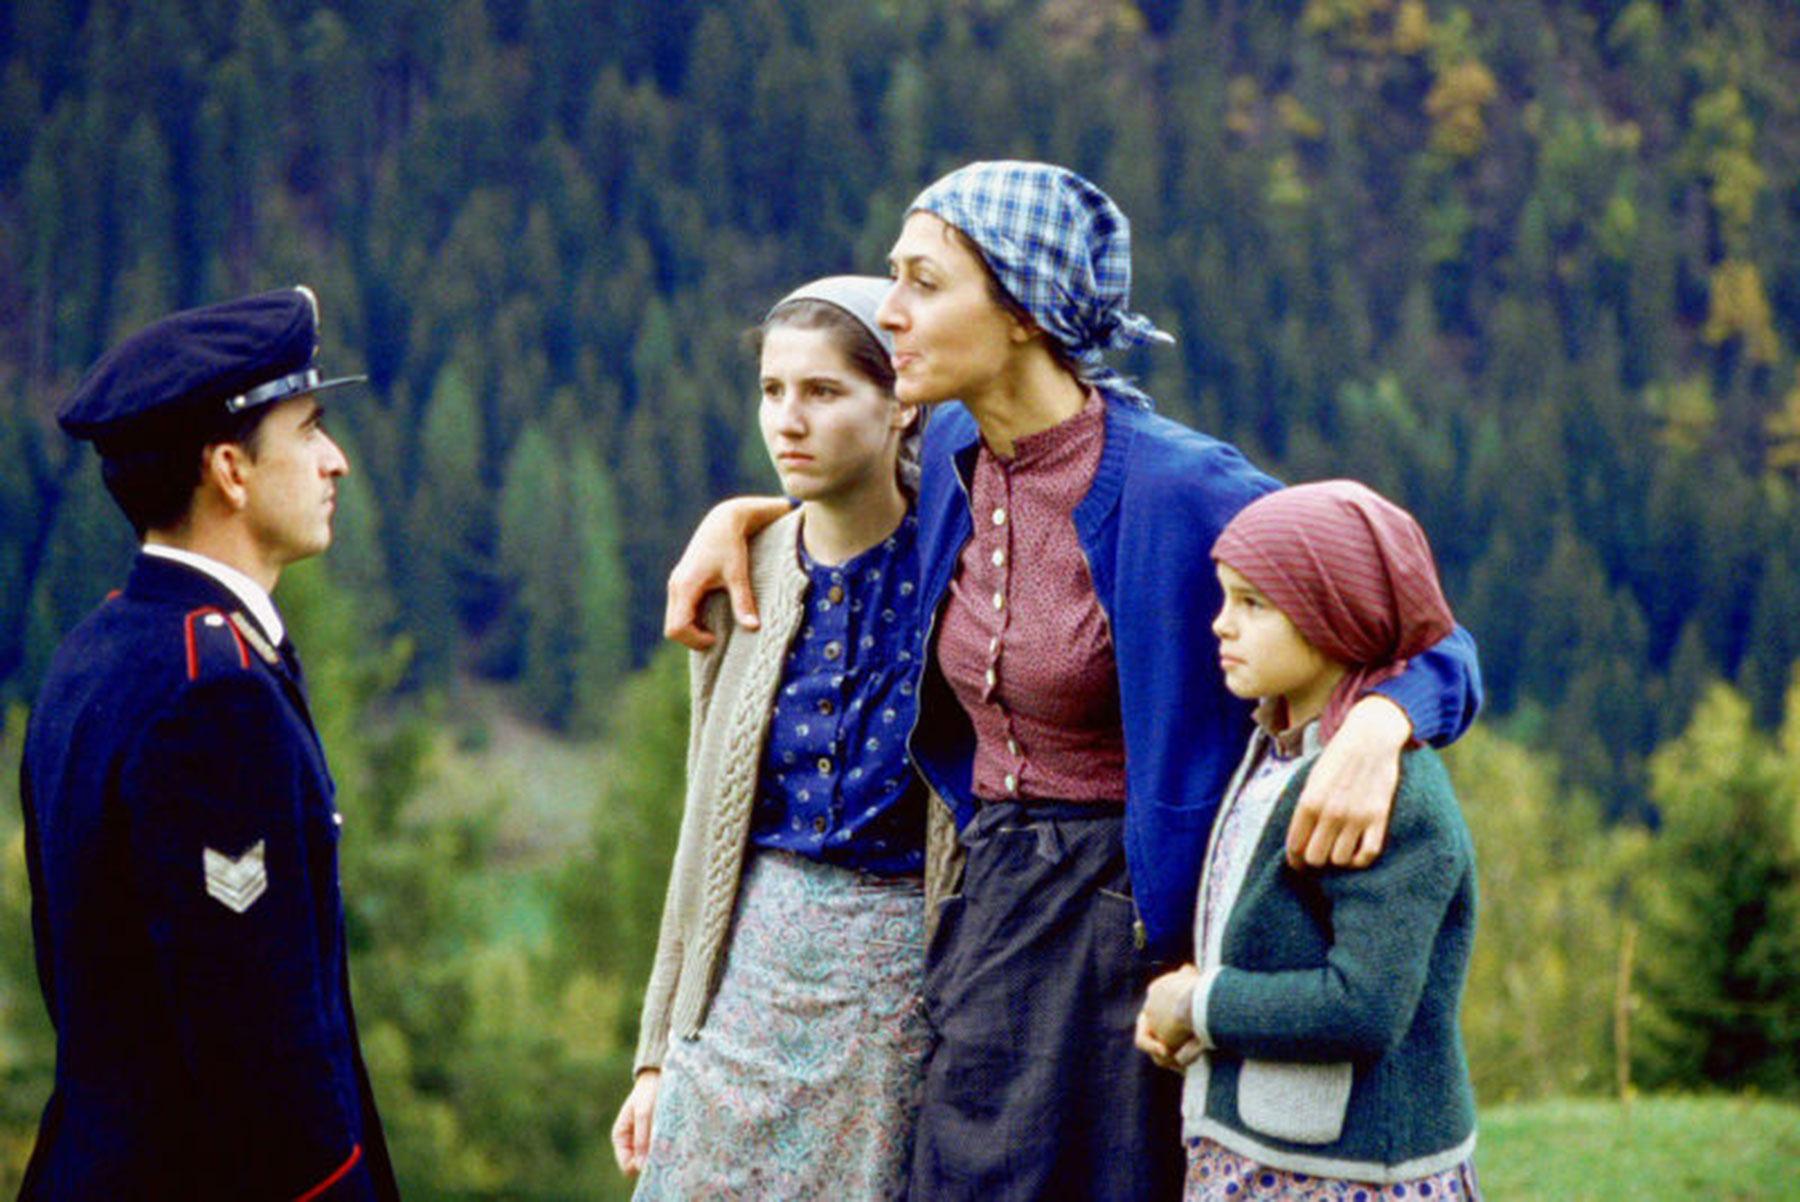 Südtiroler ZeitgeschichteFilm 'Verkaufte Heimat' – Alle 4 Teile online